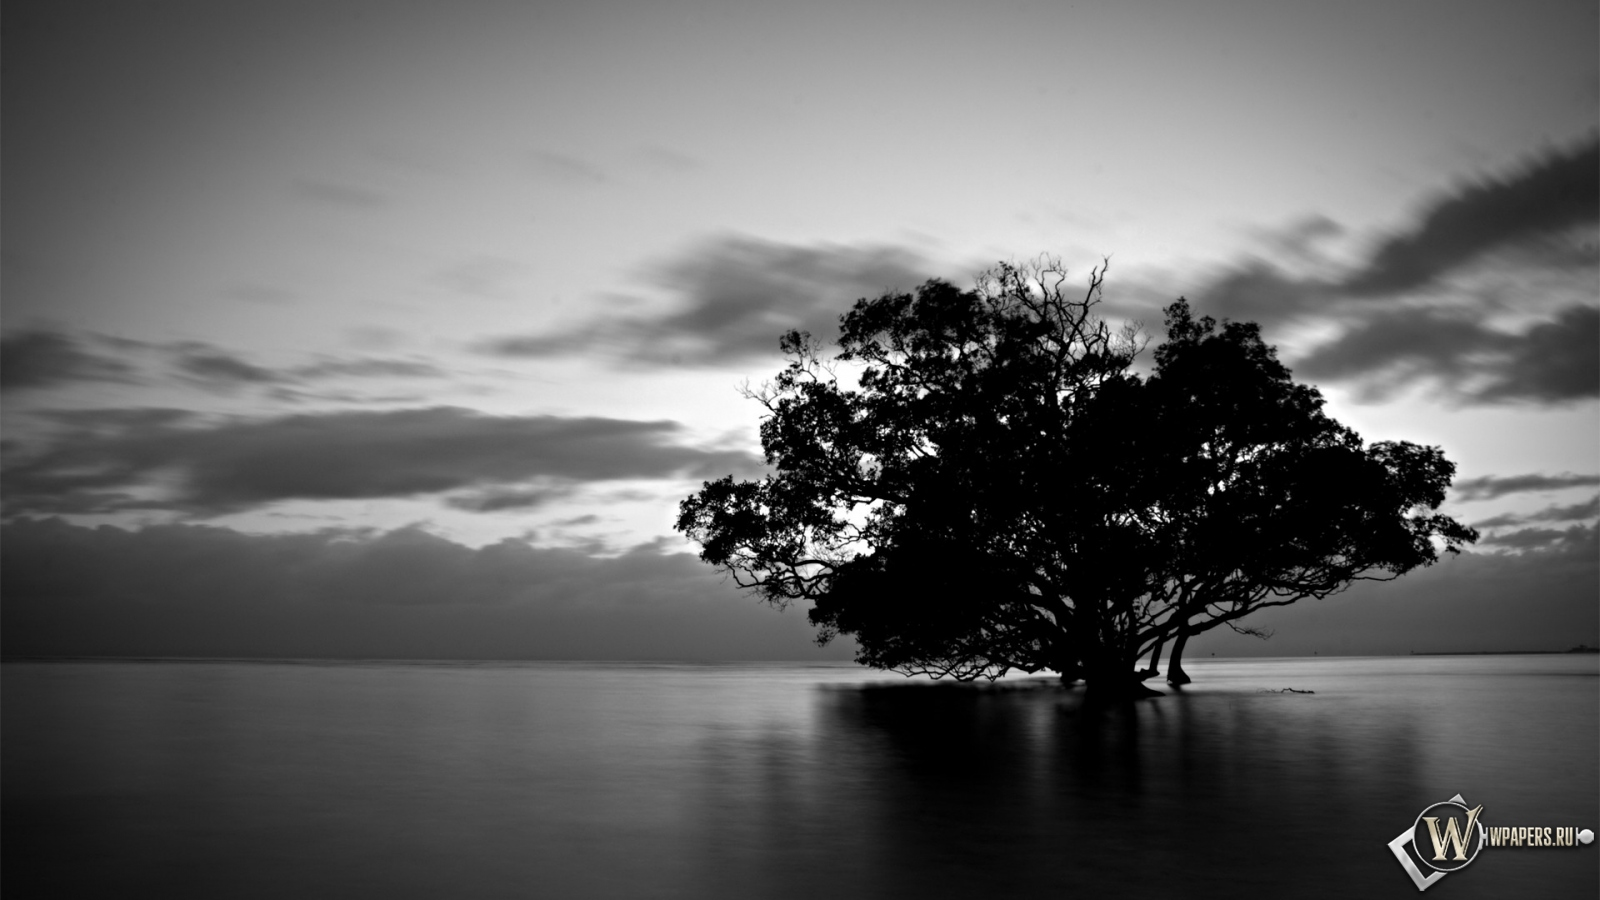 Обои дерево в воде вода природа тучи